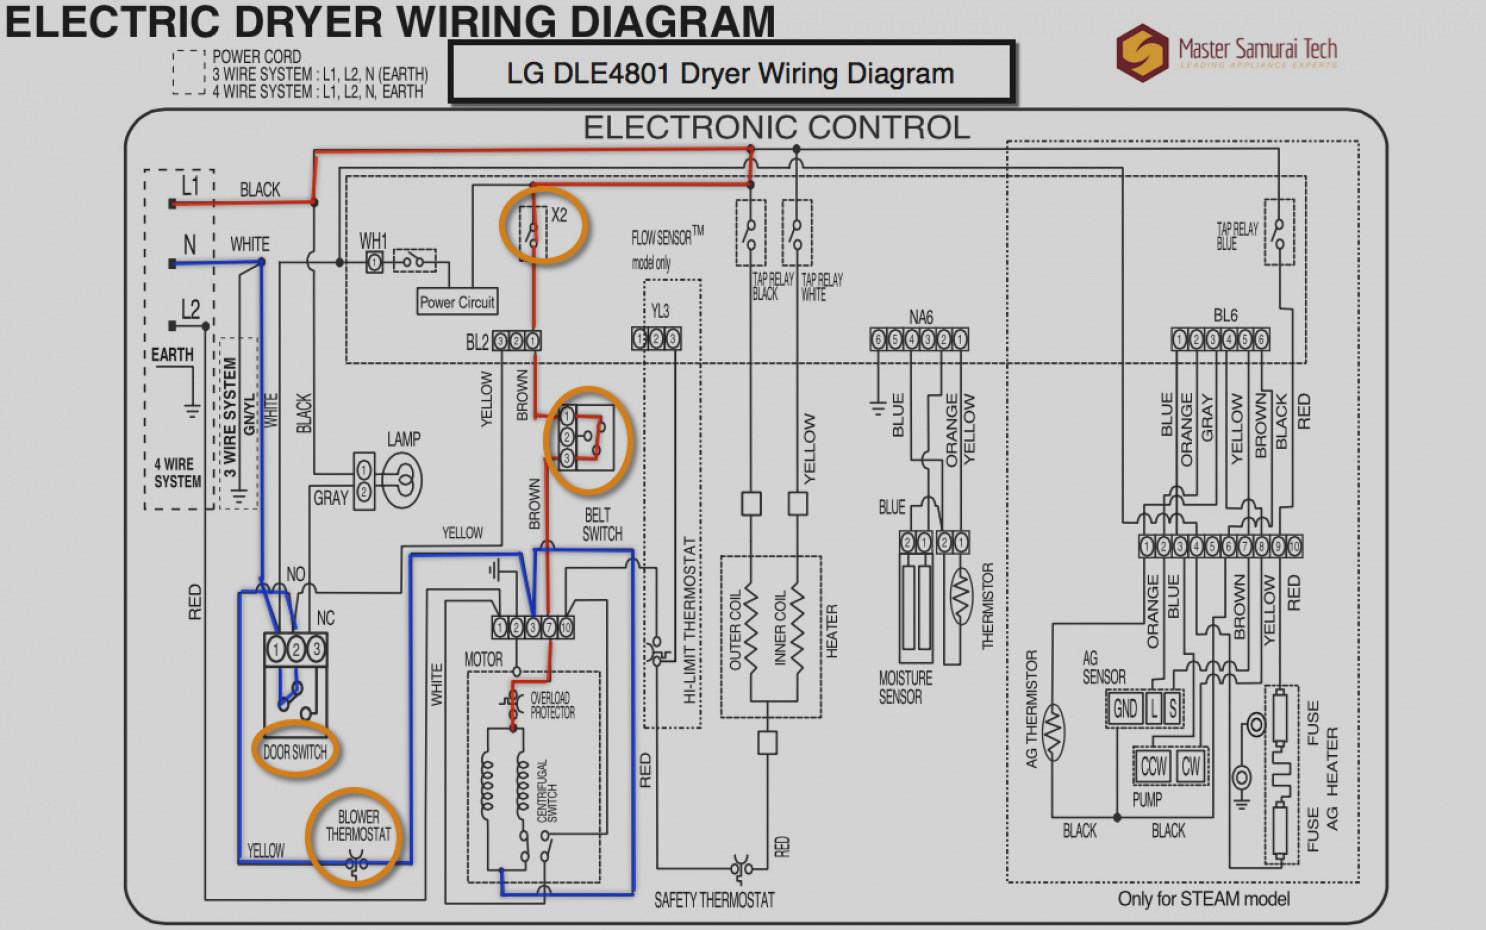 Whirlpool Thermistor Wiring Diagram Data Wiring Schema 3-Way Switch Wiring  Diagram Manual Reset Wiring Diagram